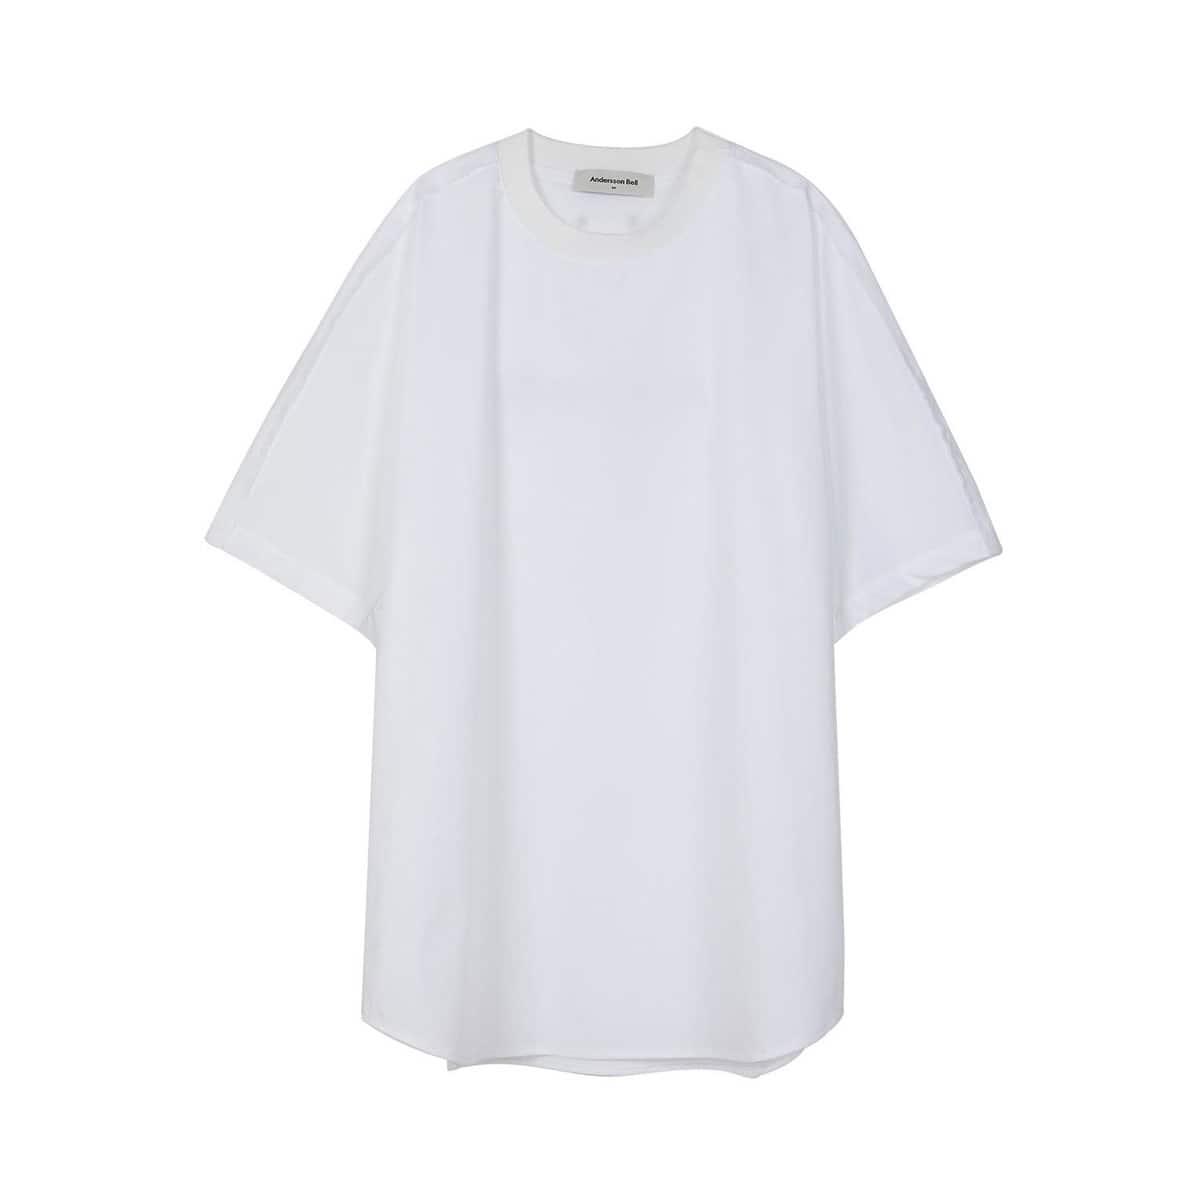 Andersson Bell POPLIN OVERSIZED LOGO PRINT T-SHIRTS WHITE 20SU-I_photo_large